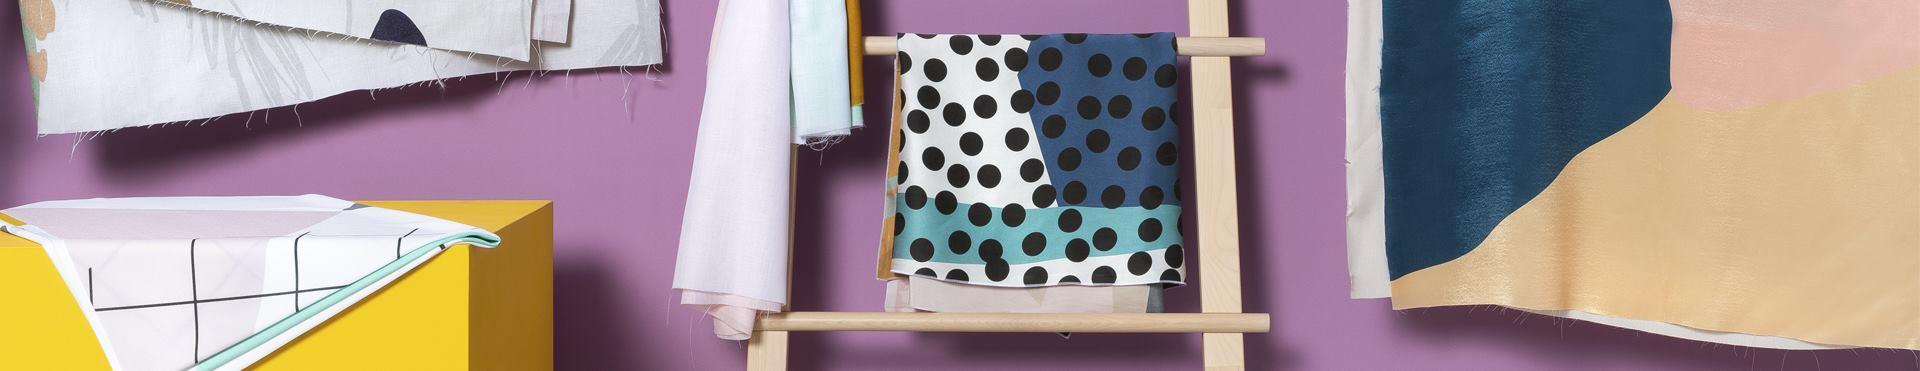 Contrado Fabric Printing